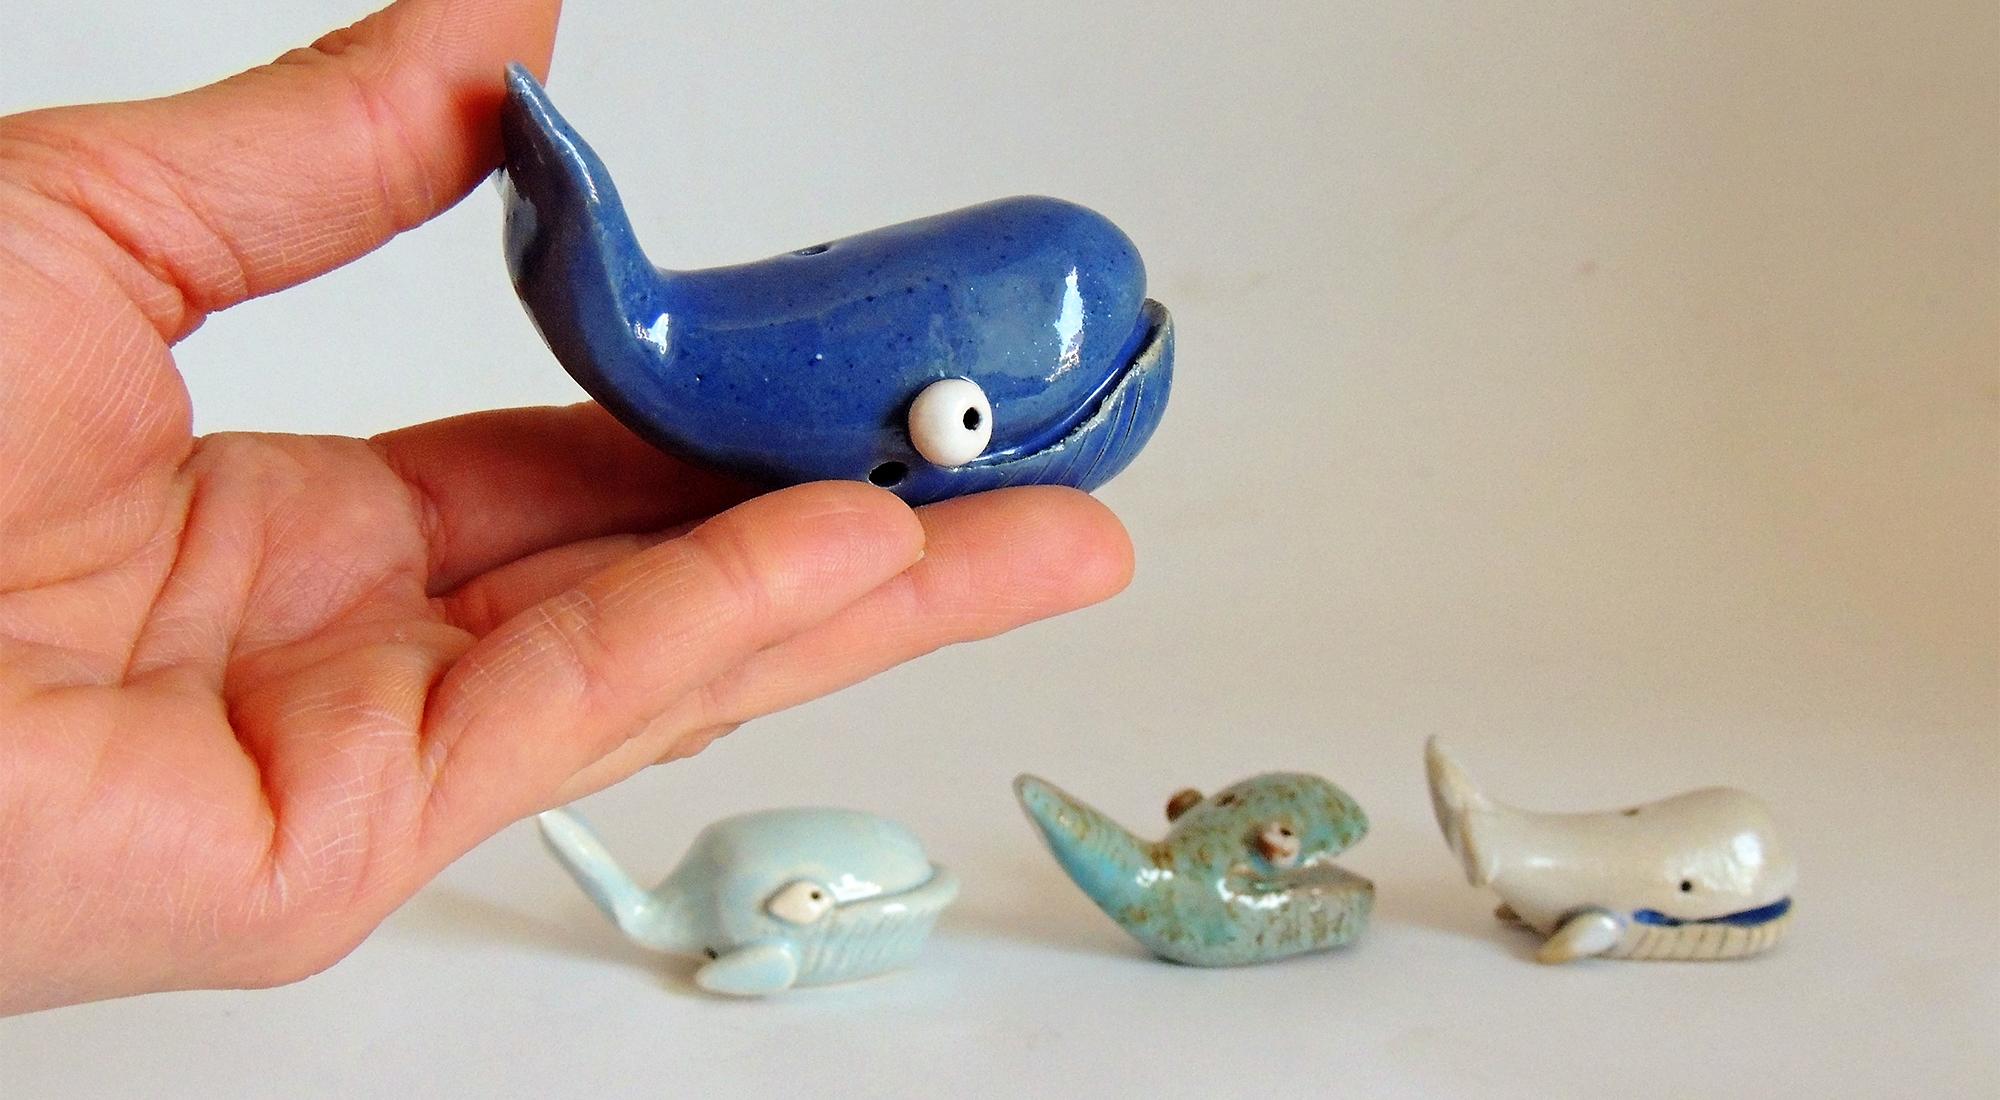 greta filippini oca ceramica artistica ferrara balene pesci